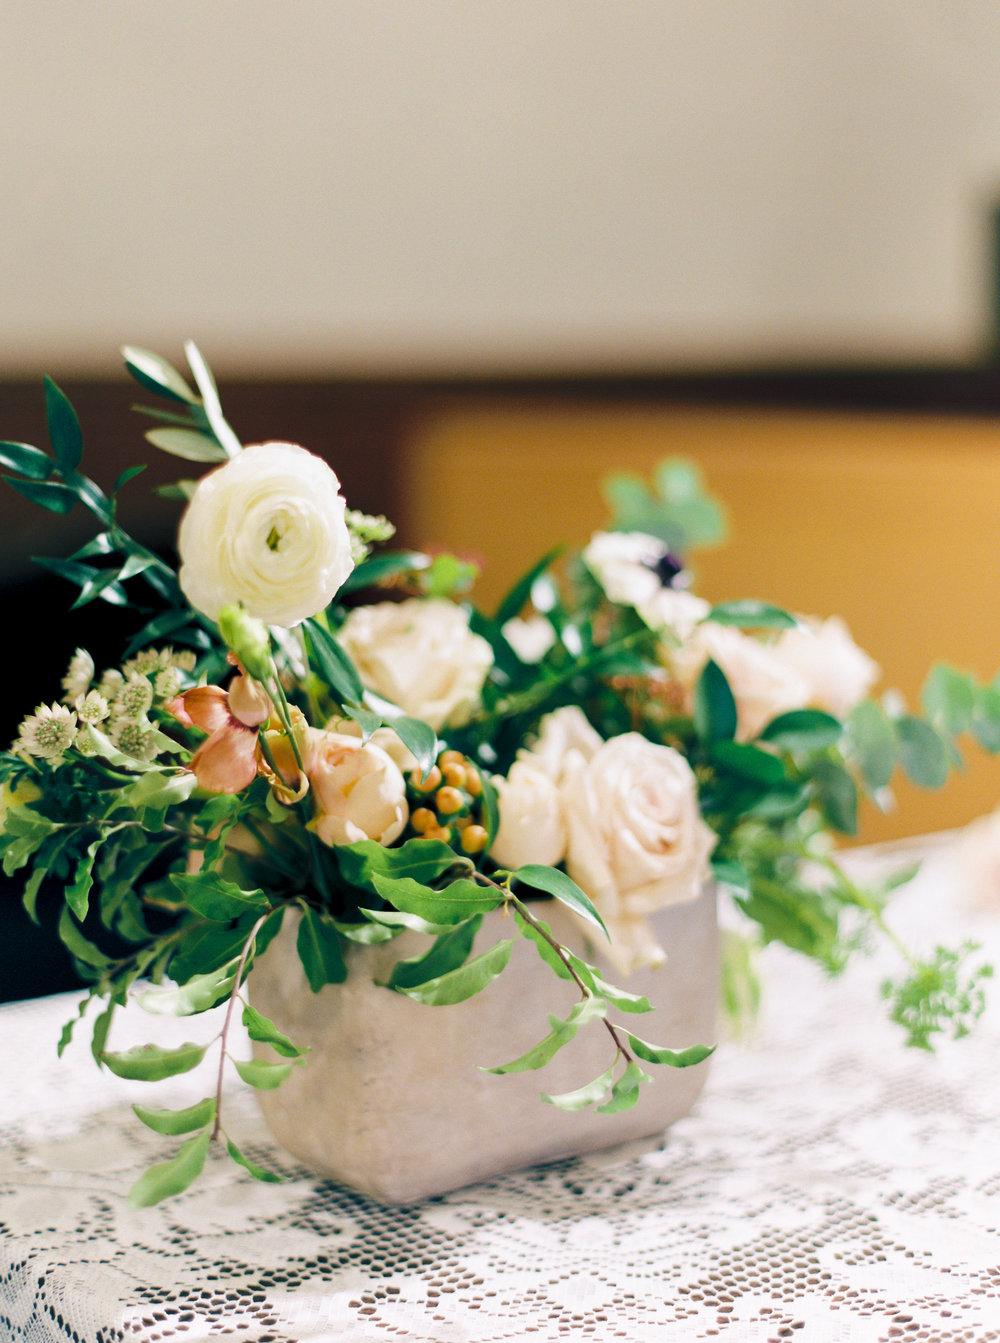 Log-cabin-wedding-in-presidio-san-francisco-california-desintation-wedding-photography-91.jpg